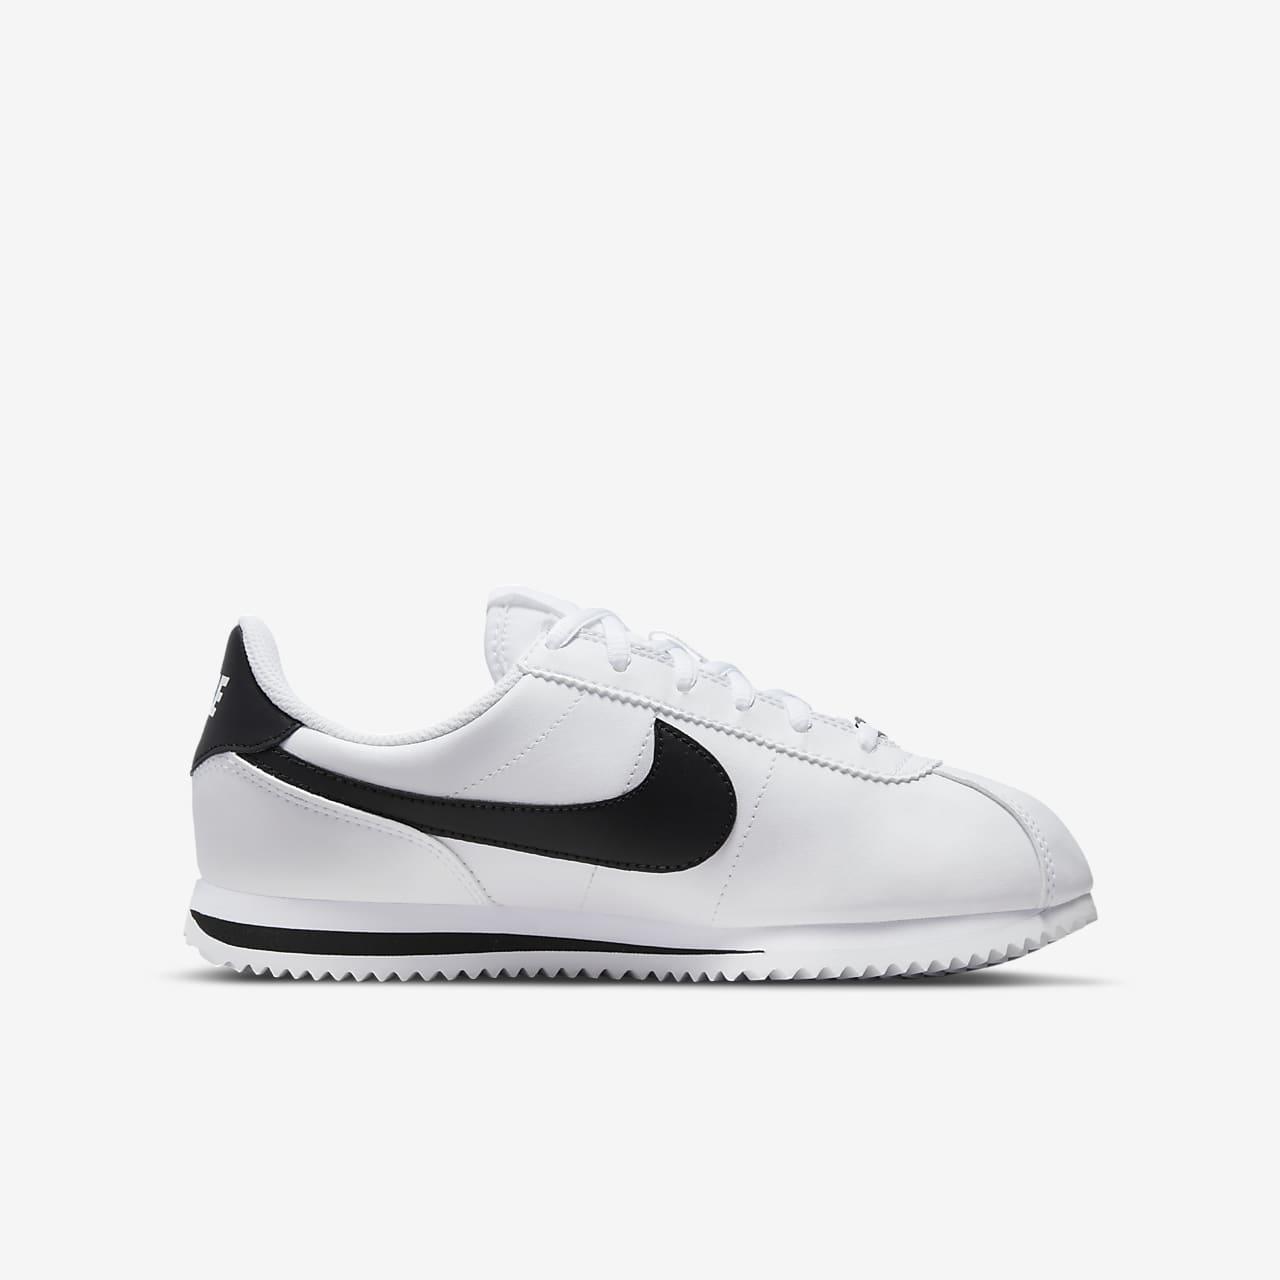 new style e98e0 cd686 ... Nike Cortez Basic SL Older Kids  Shoe